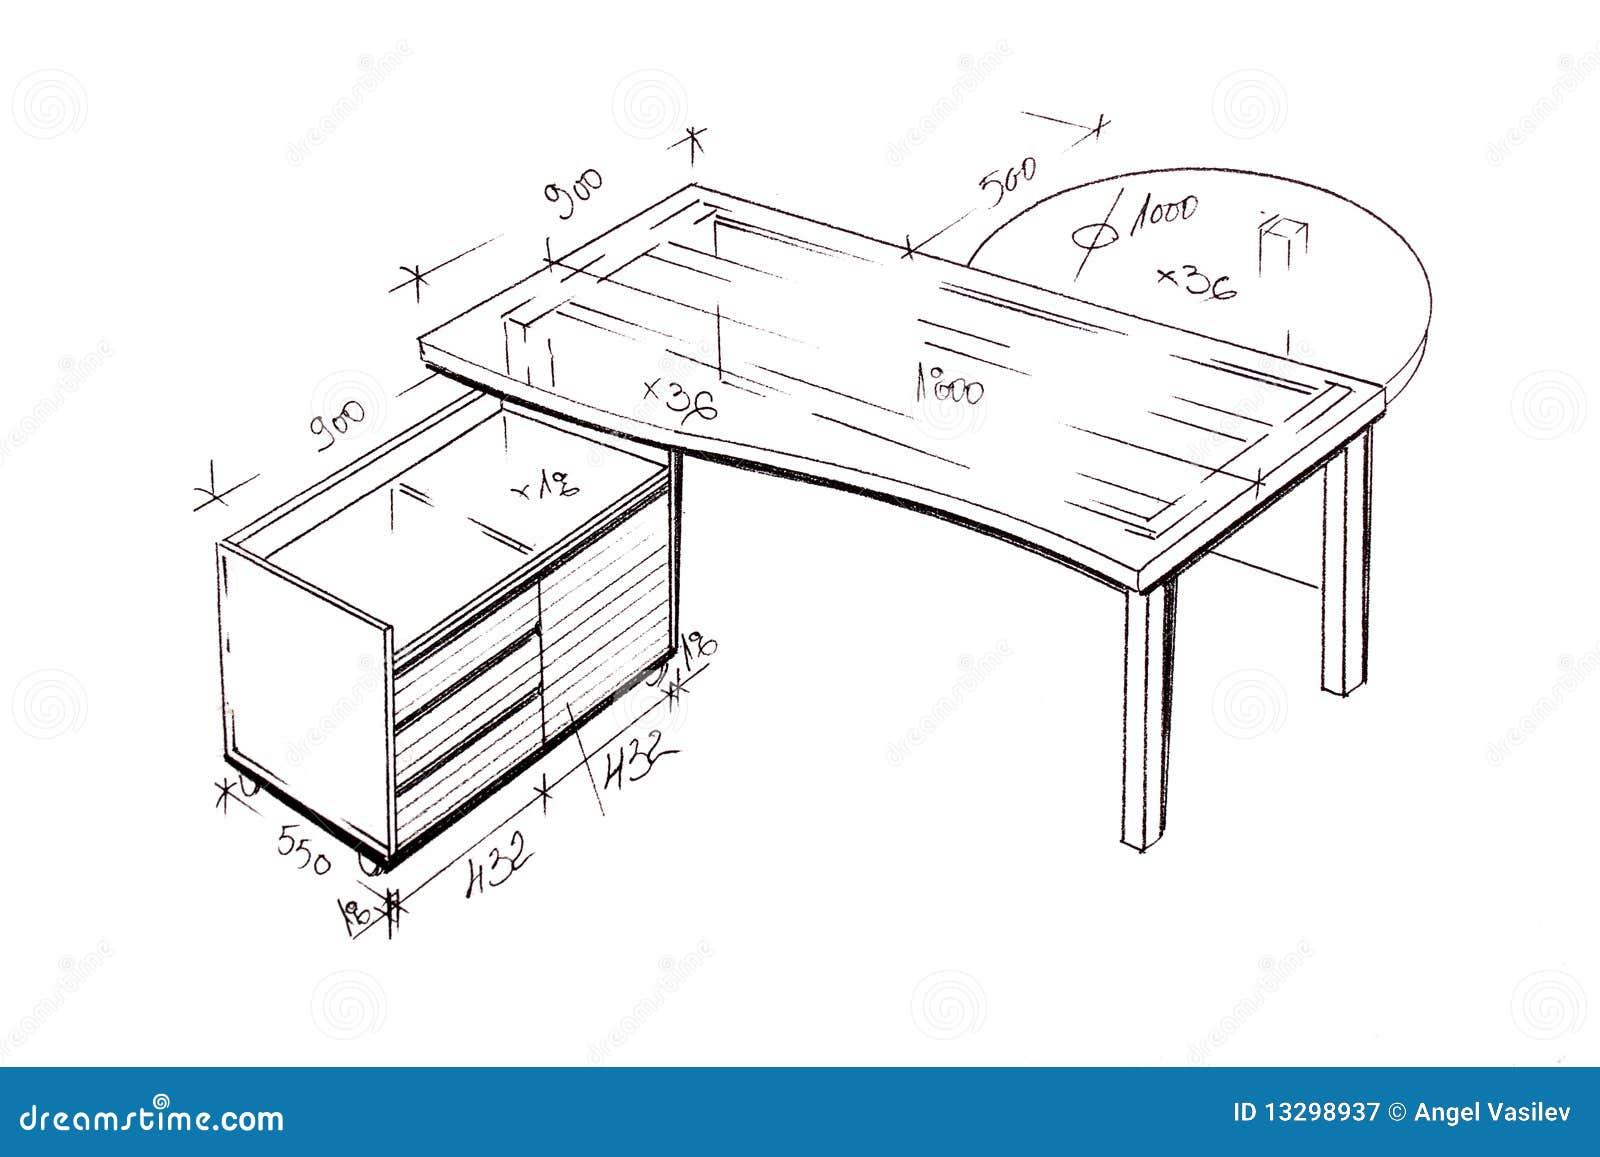 Gr fico a pulso del escritorio moderno del dise o interior for Diseno de interiores escritorios